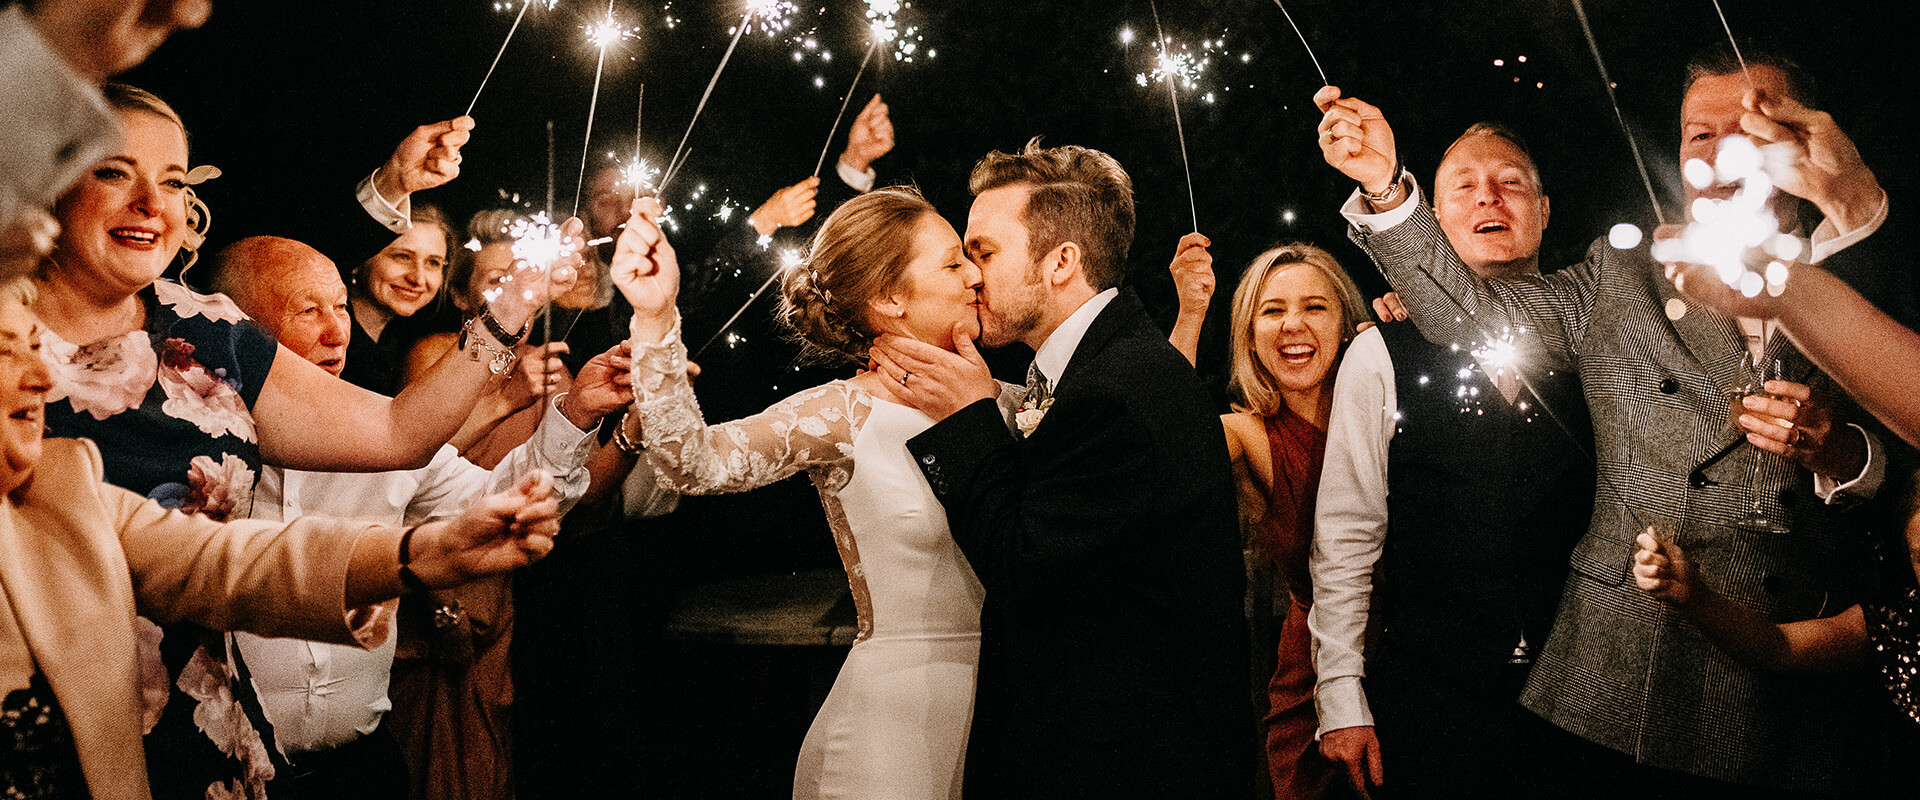 Lancashire wedding with sparklers